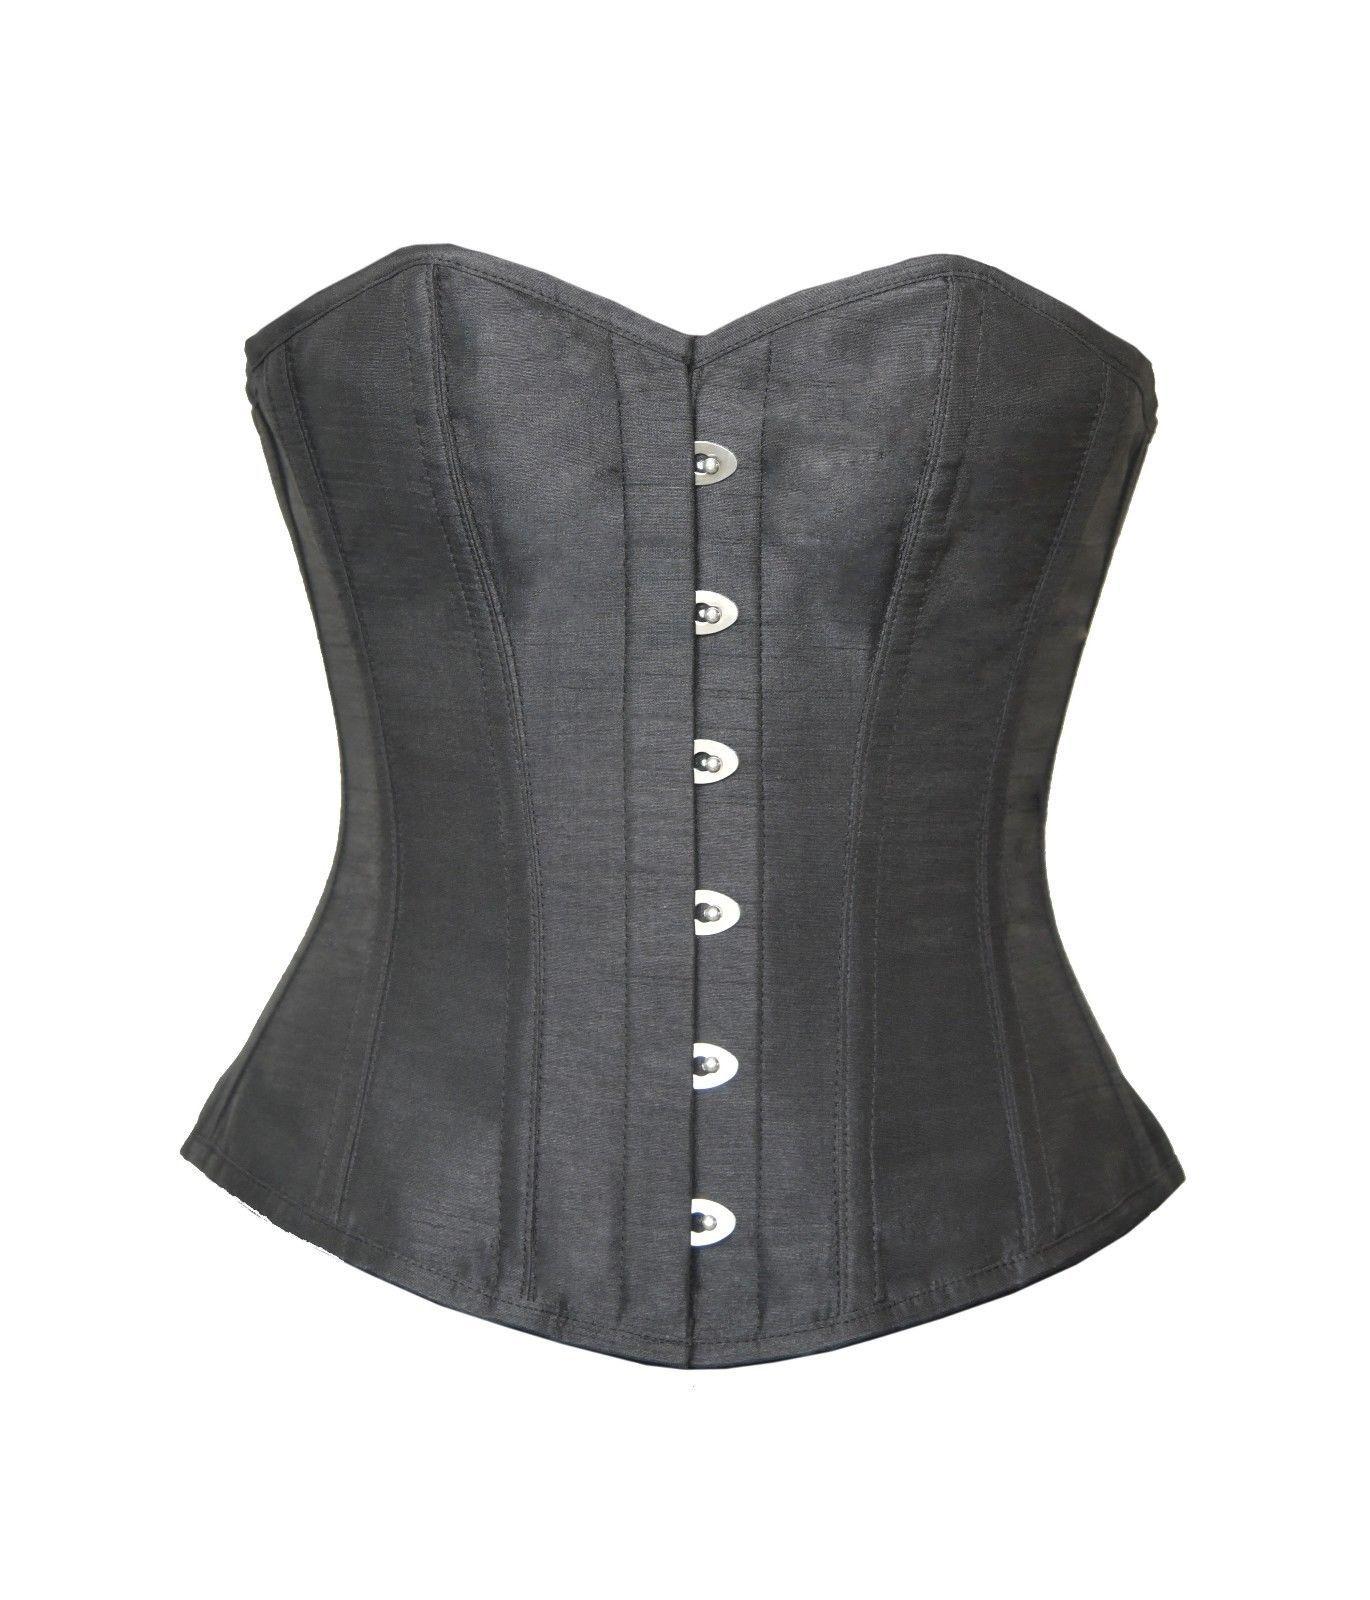 Black Silk Gothic Burlesque Costume Waist Cincher Basque Overbust Bustier Corset